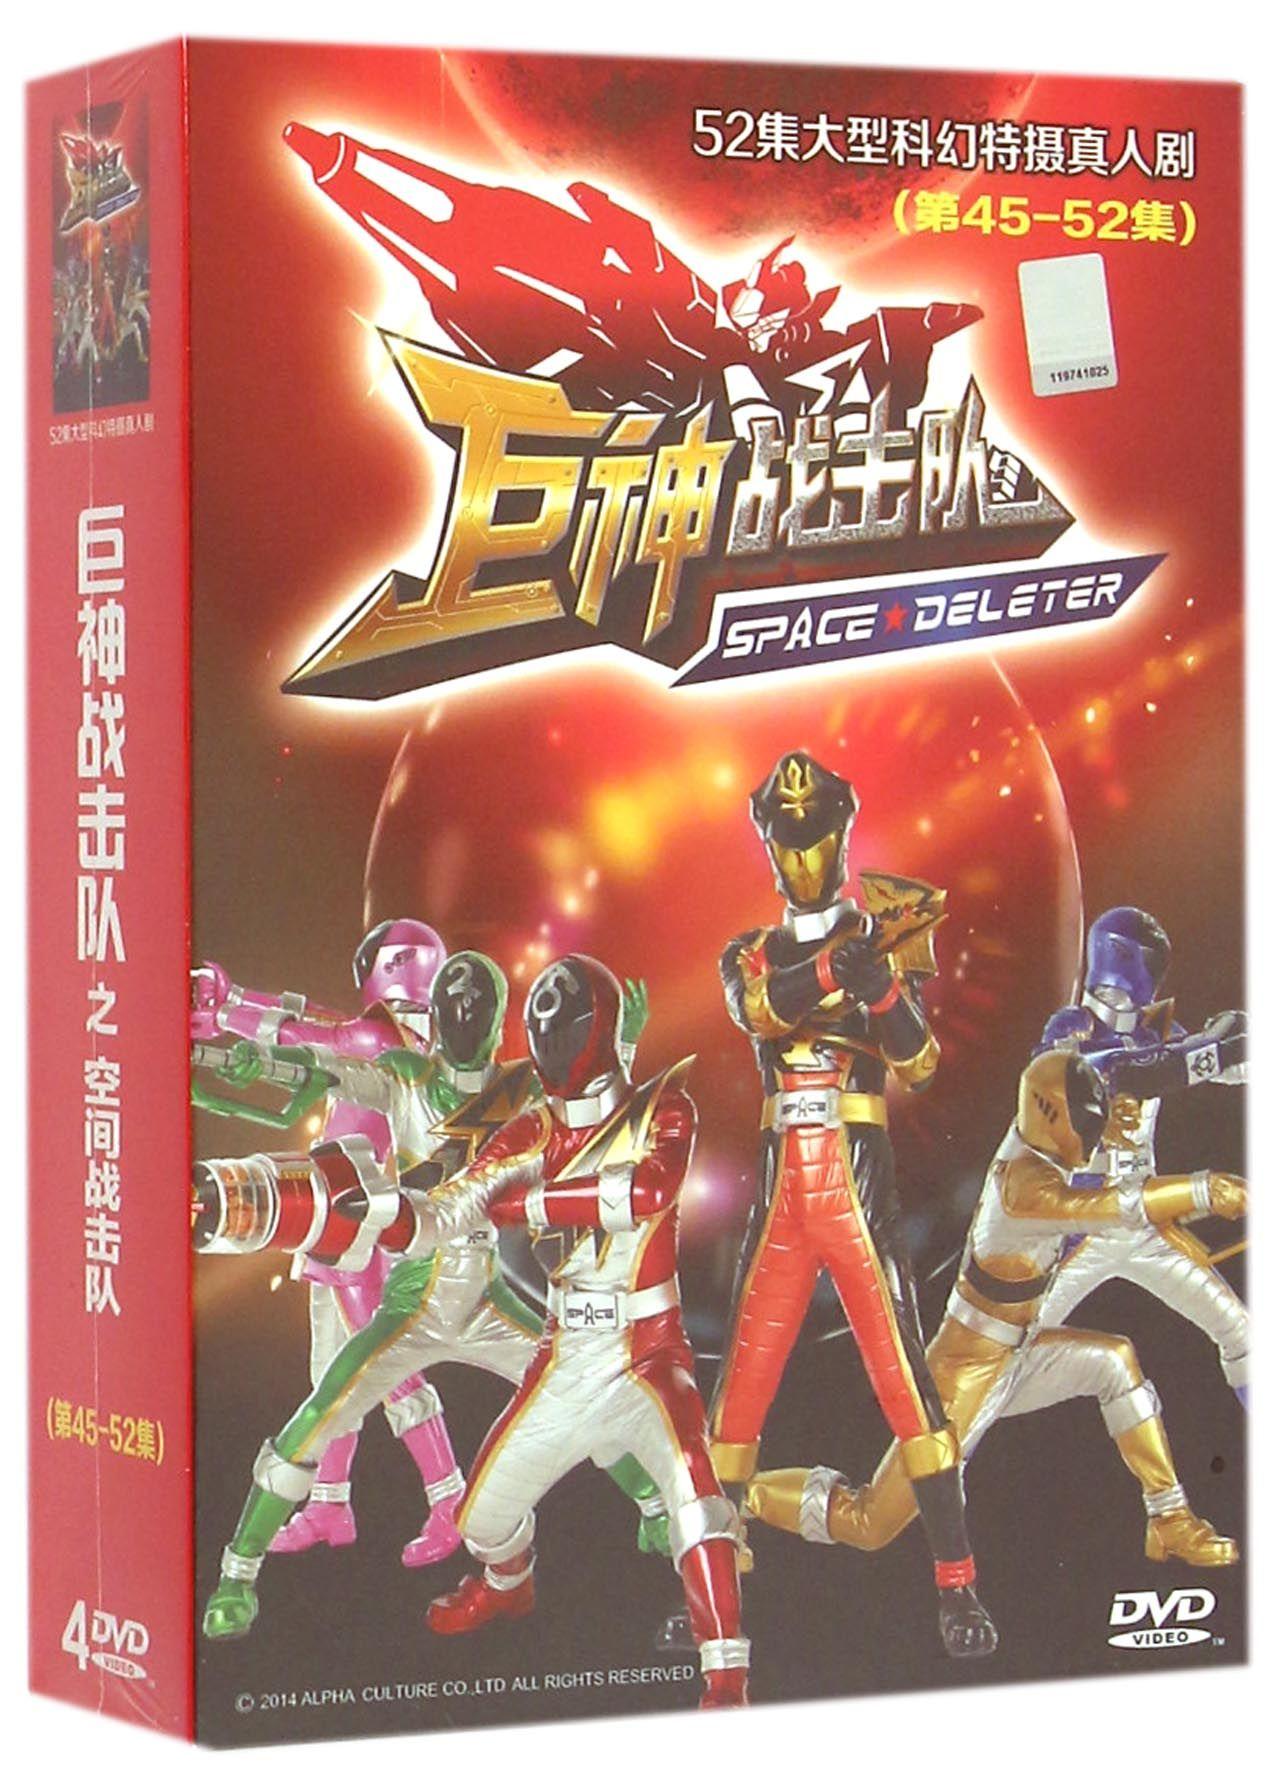 dvd巨神战击队之空间战击队 第45-52集>(4碟装)-巨神战击队2玩具图片